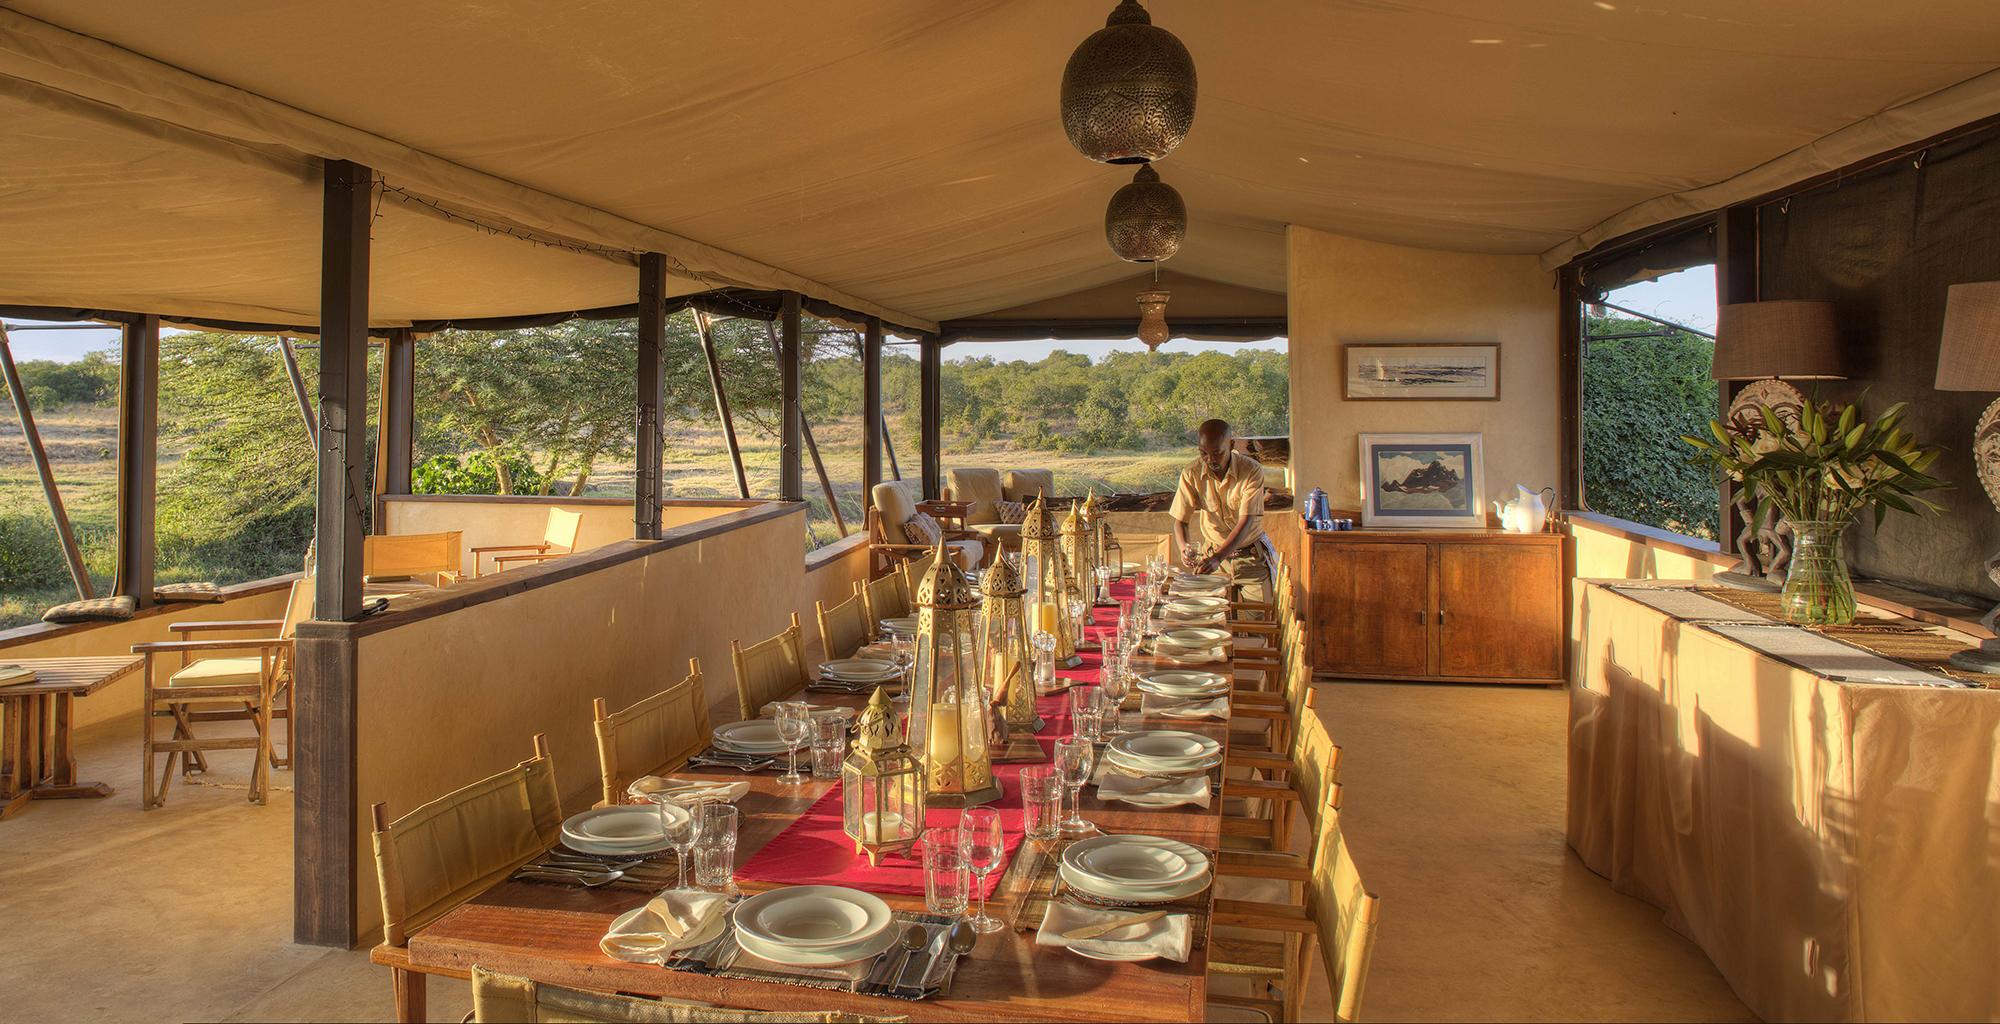 Kenya-Ol-Pejeta-Dining